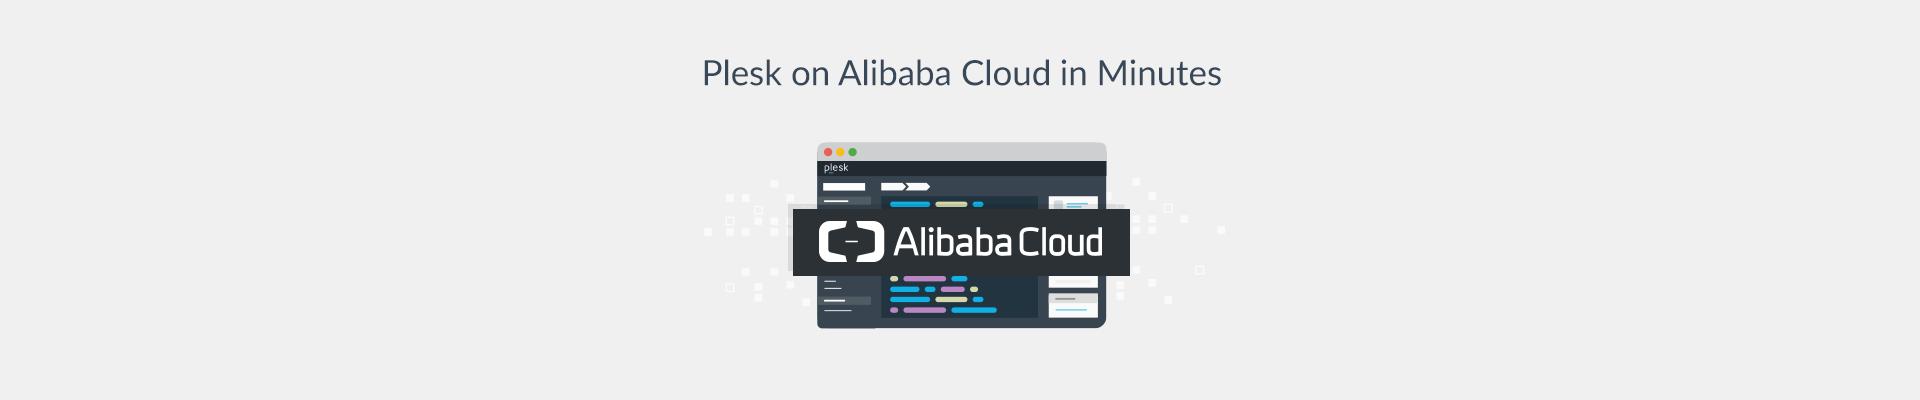 Install Plesk on Alibaba Cloud